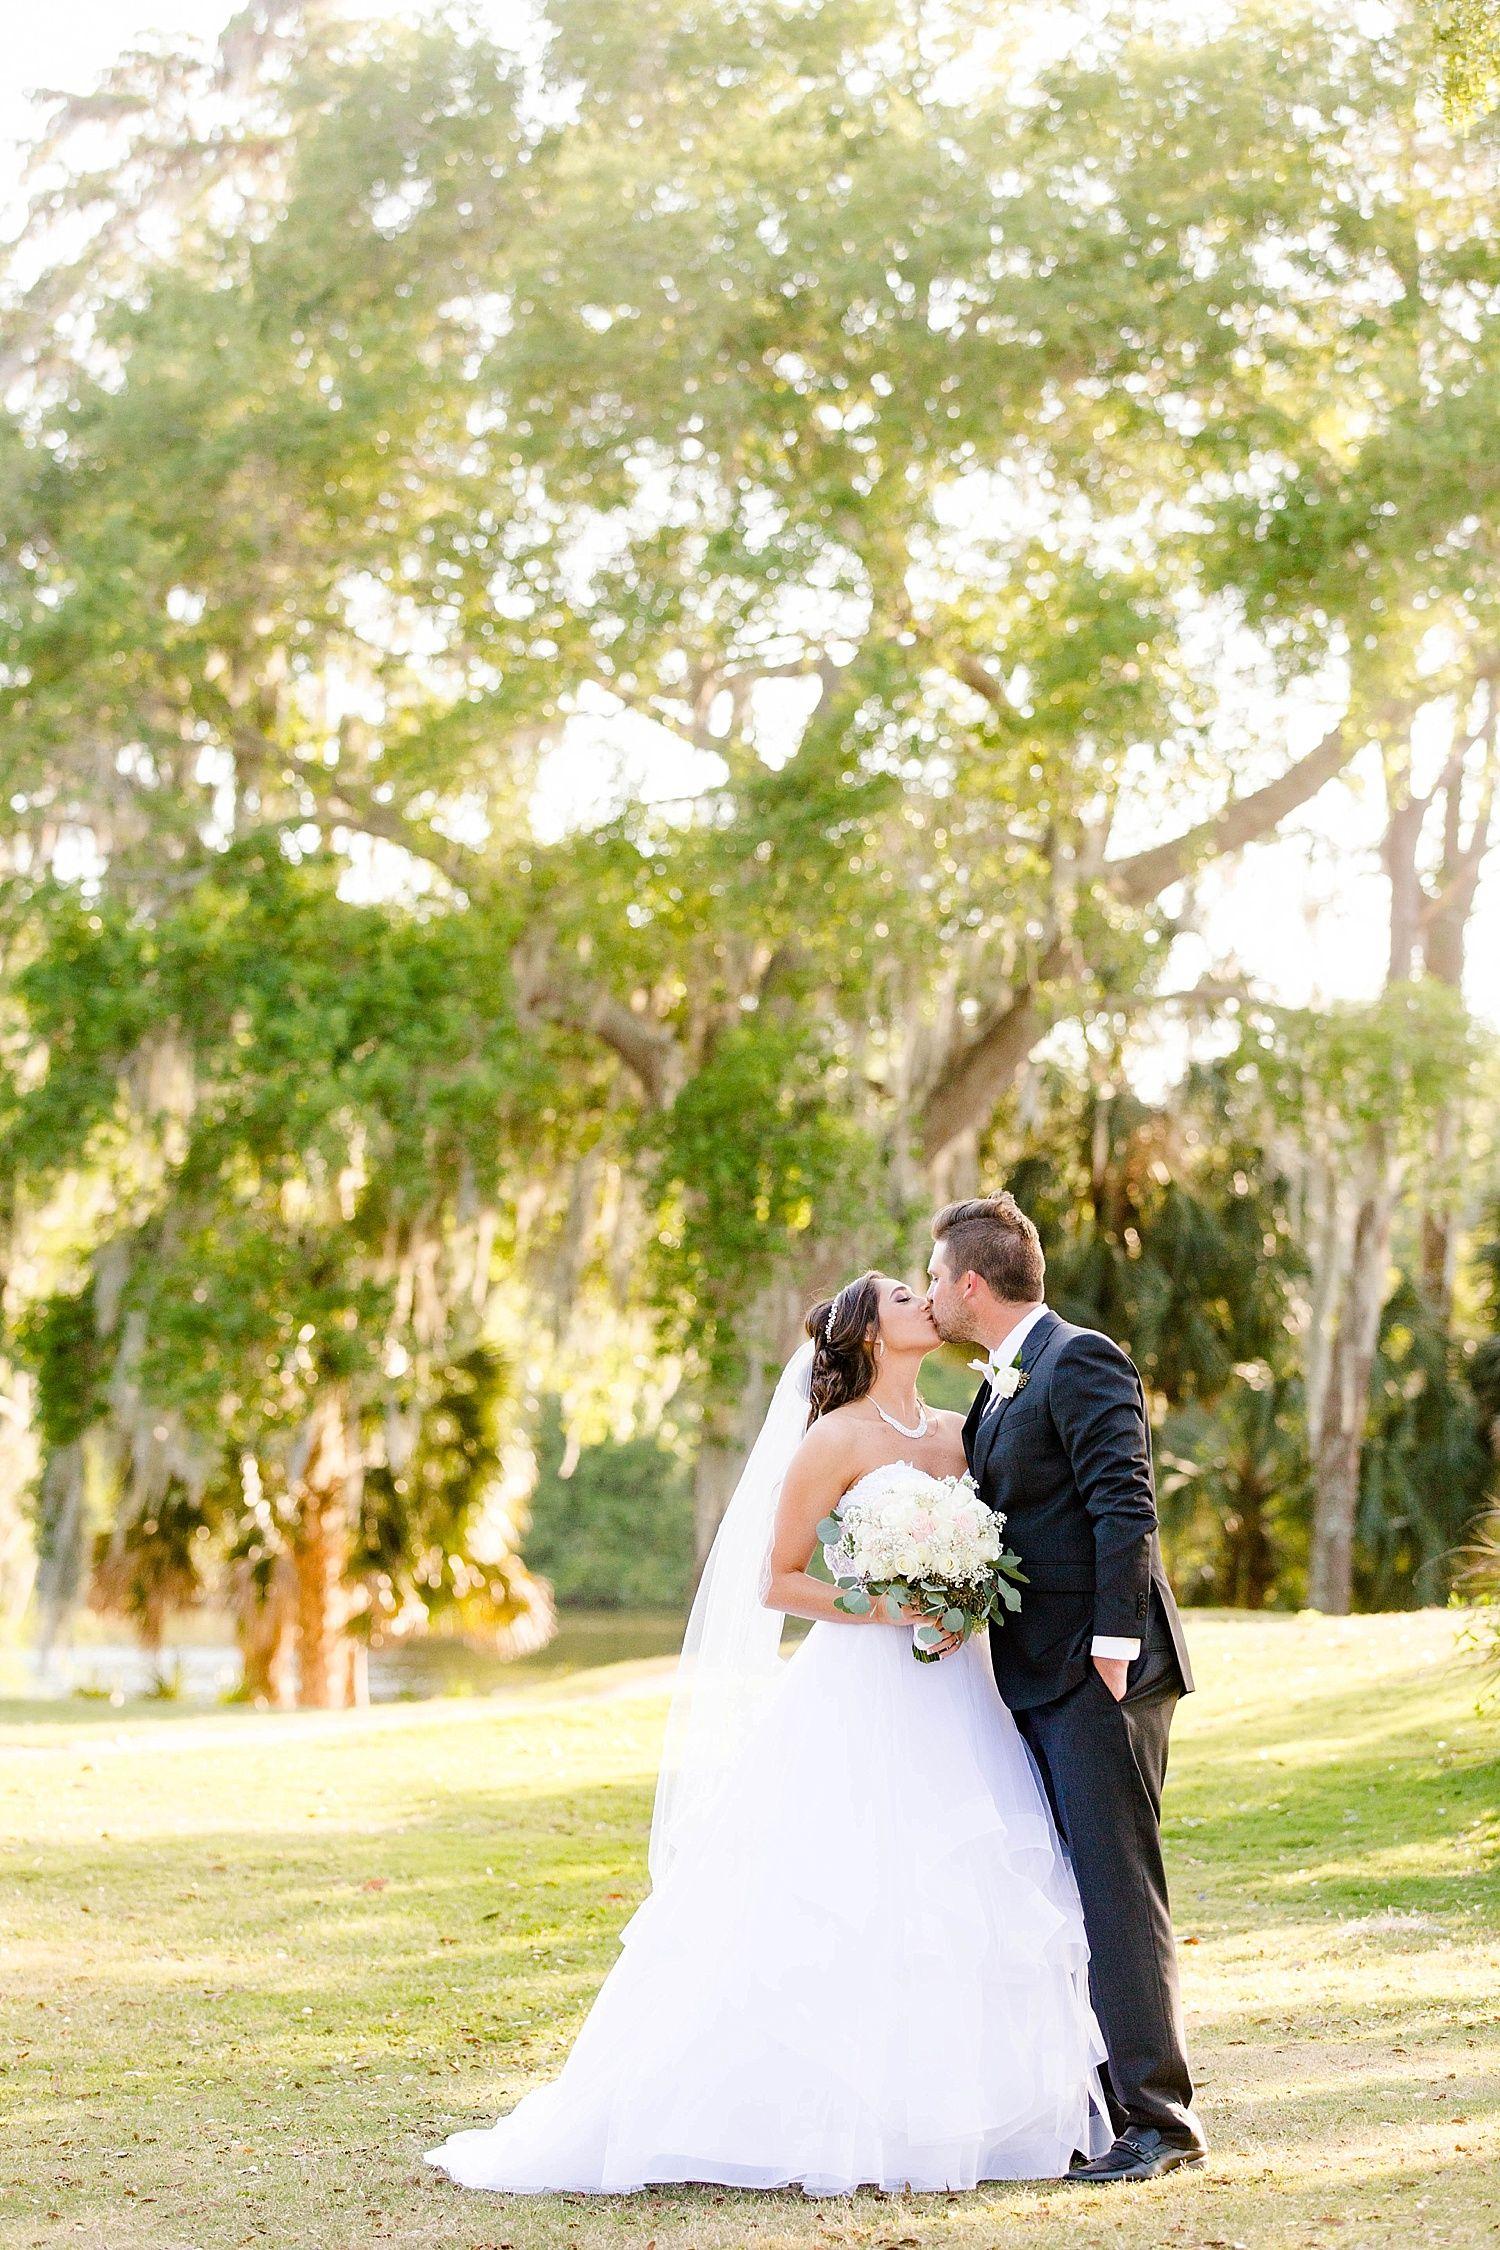 Tampa Wedding Photography - Innisbrook Resort By